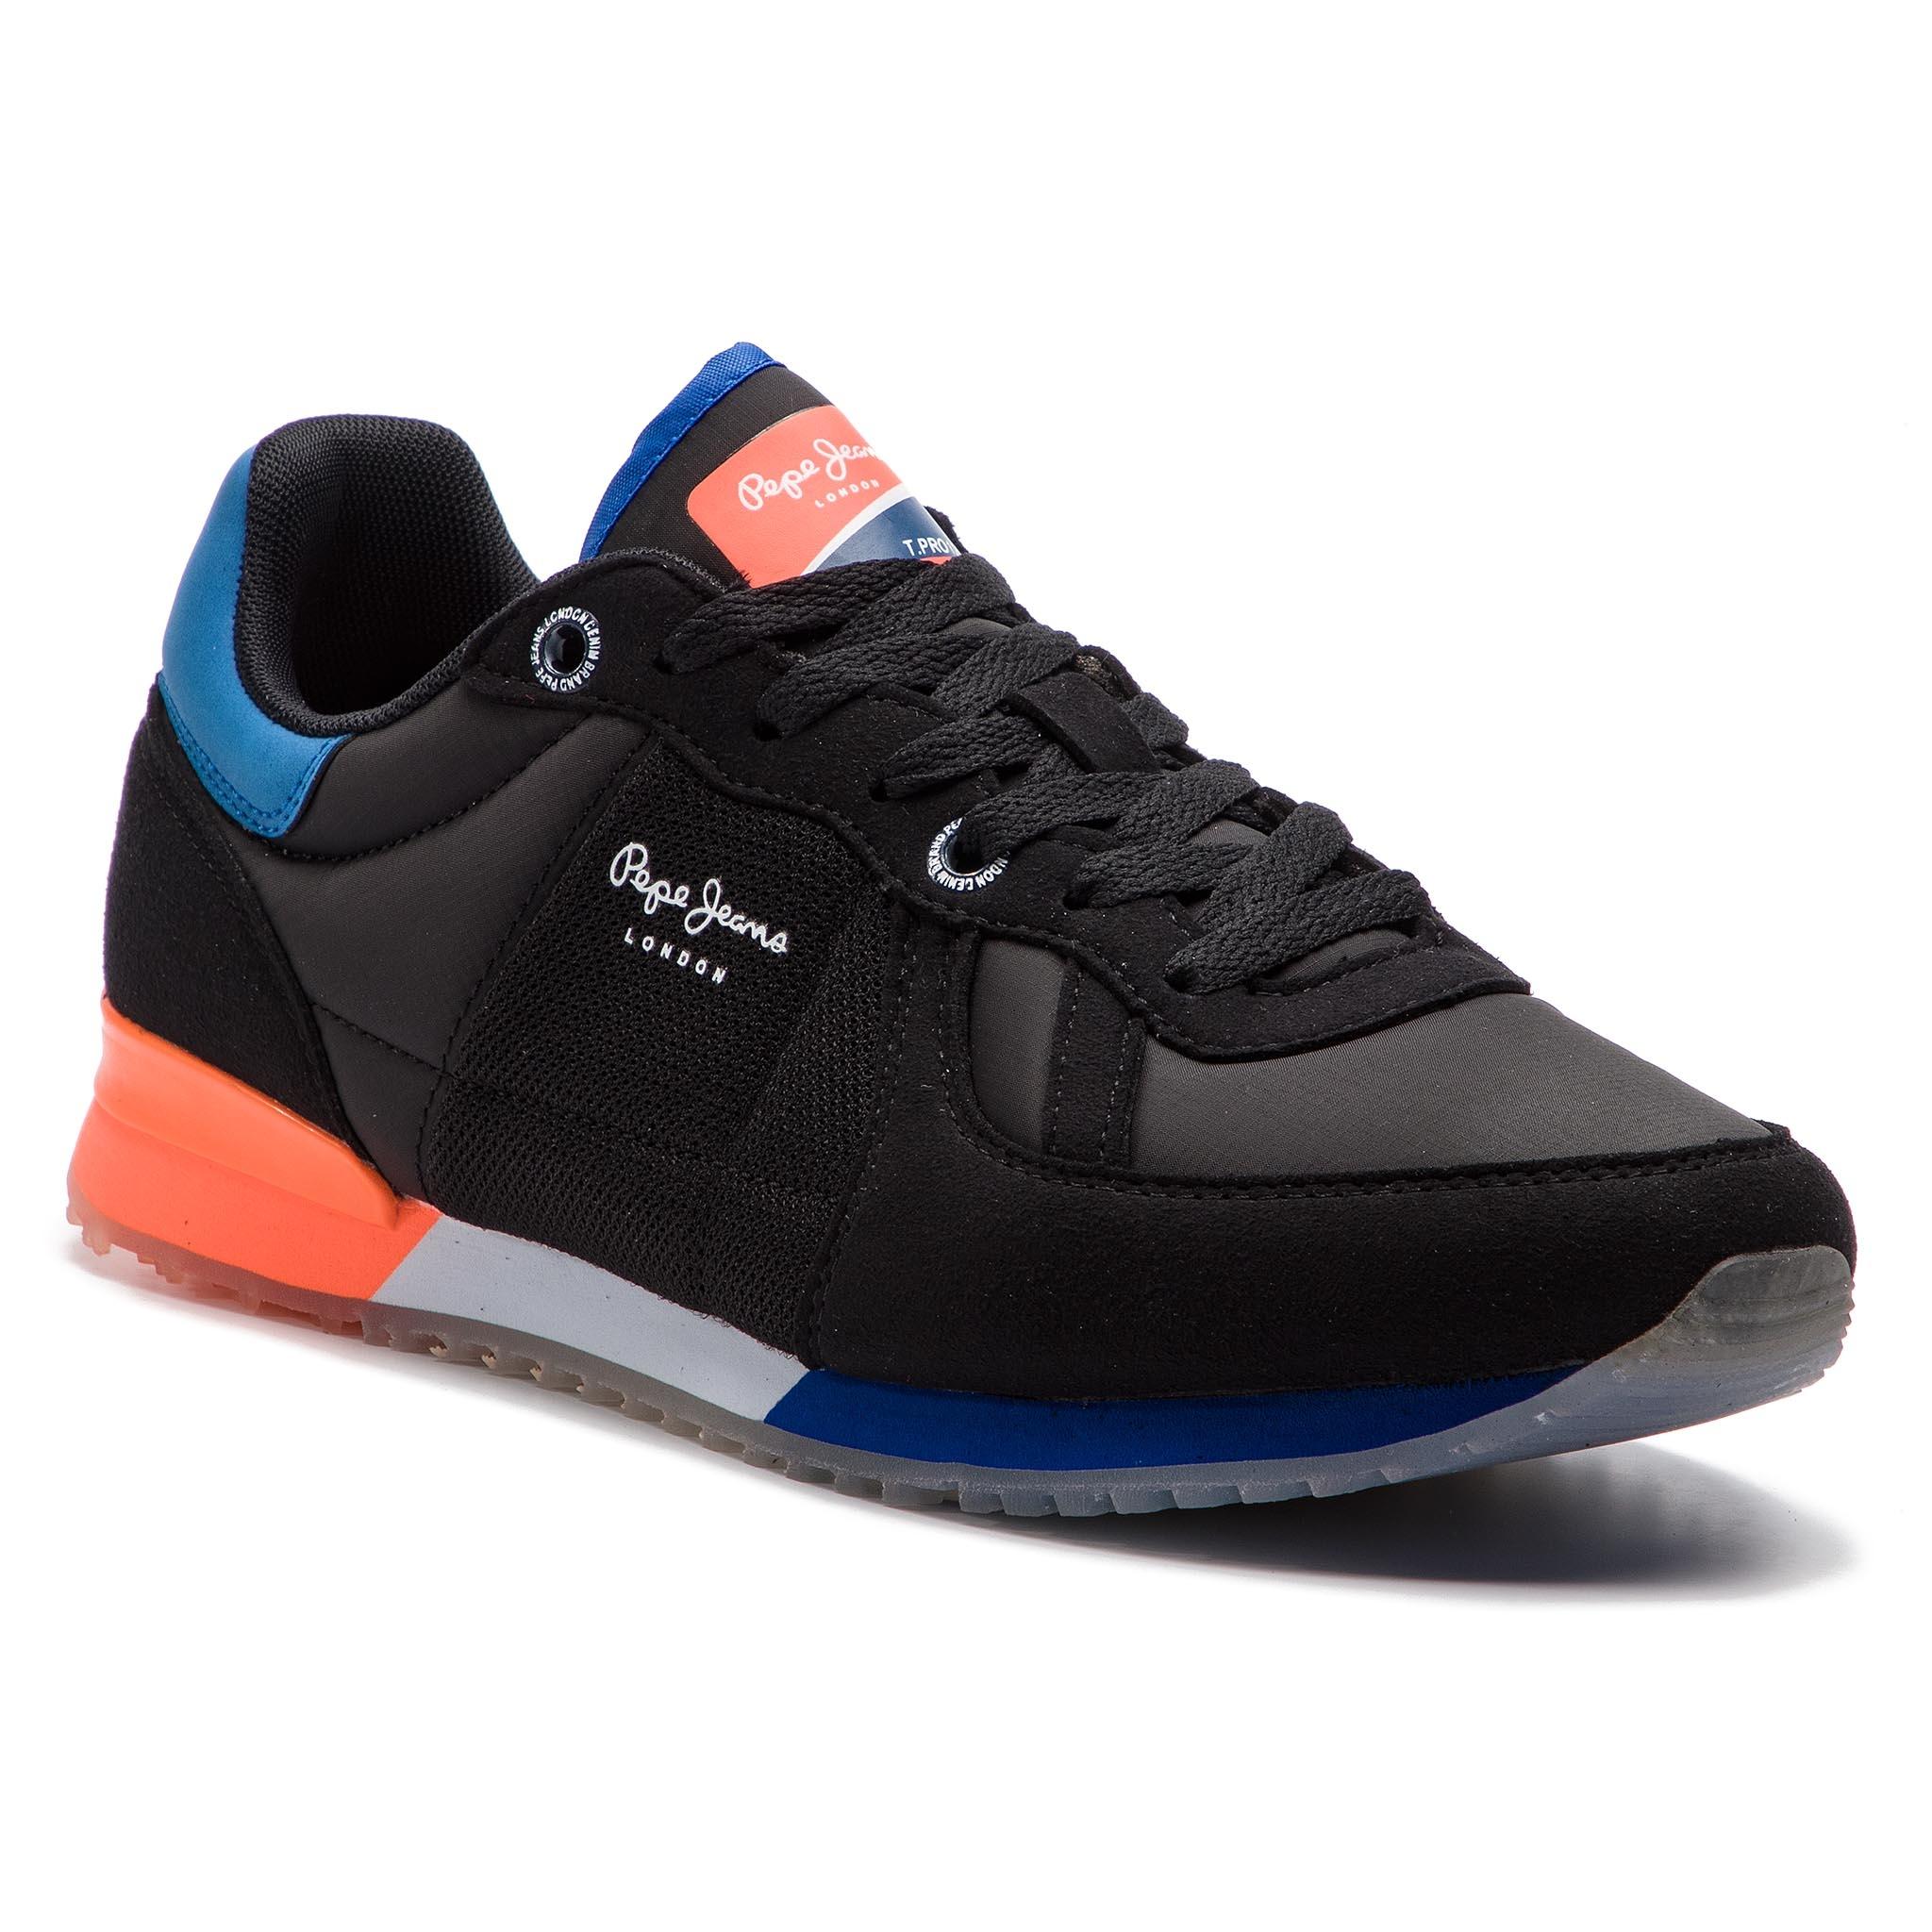 fdeb1573e4cb0 Sneakers PEPE JEANS - Tinker Pro 73 Fusion PMS30528 Grey 945 ...